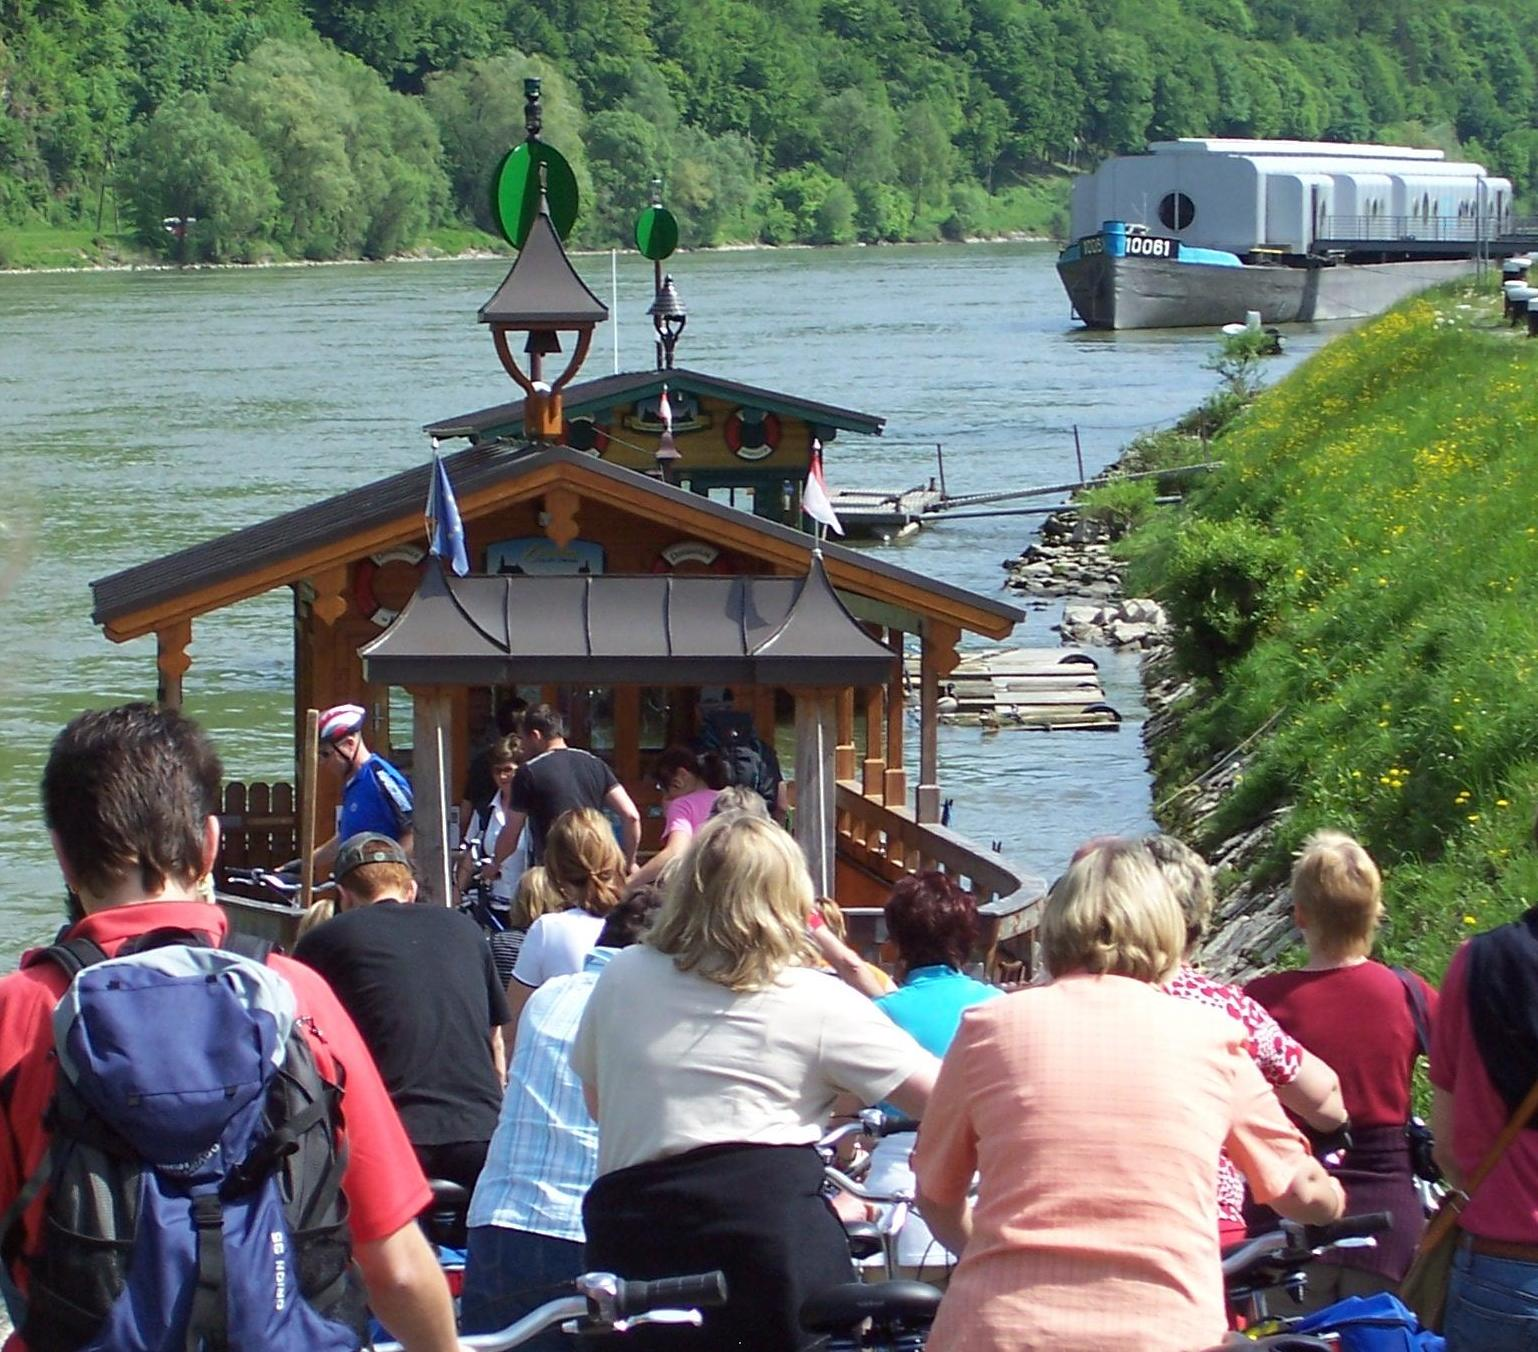 Donaufähre bei Engelhartszell